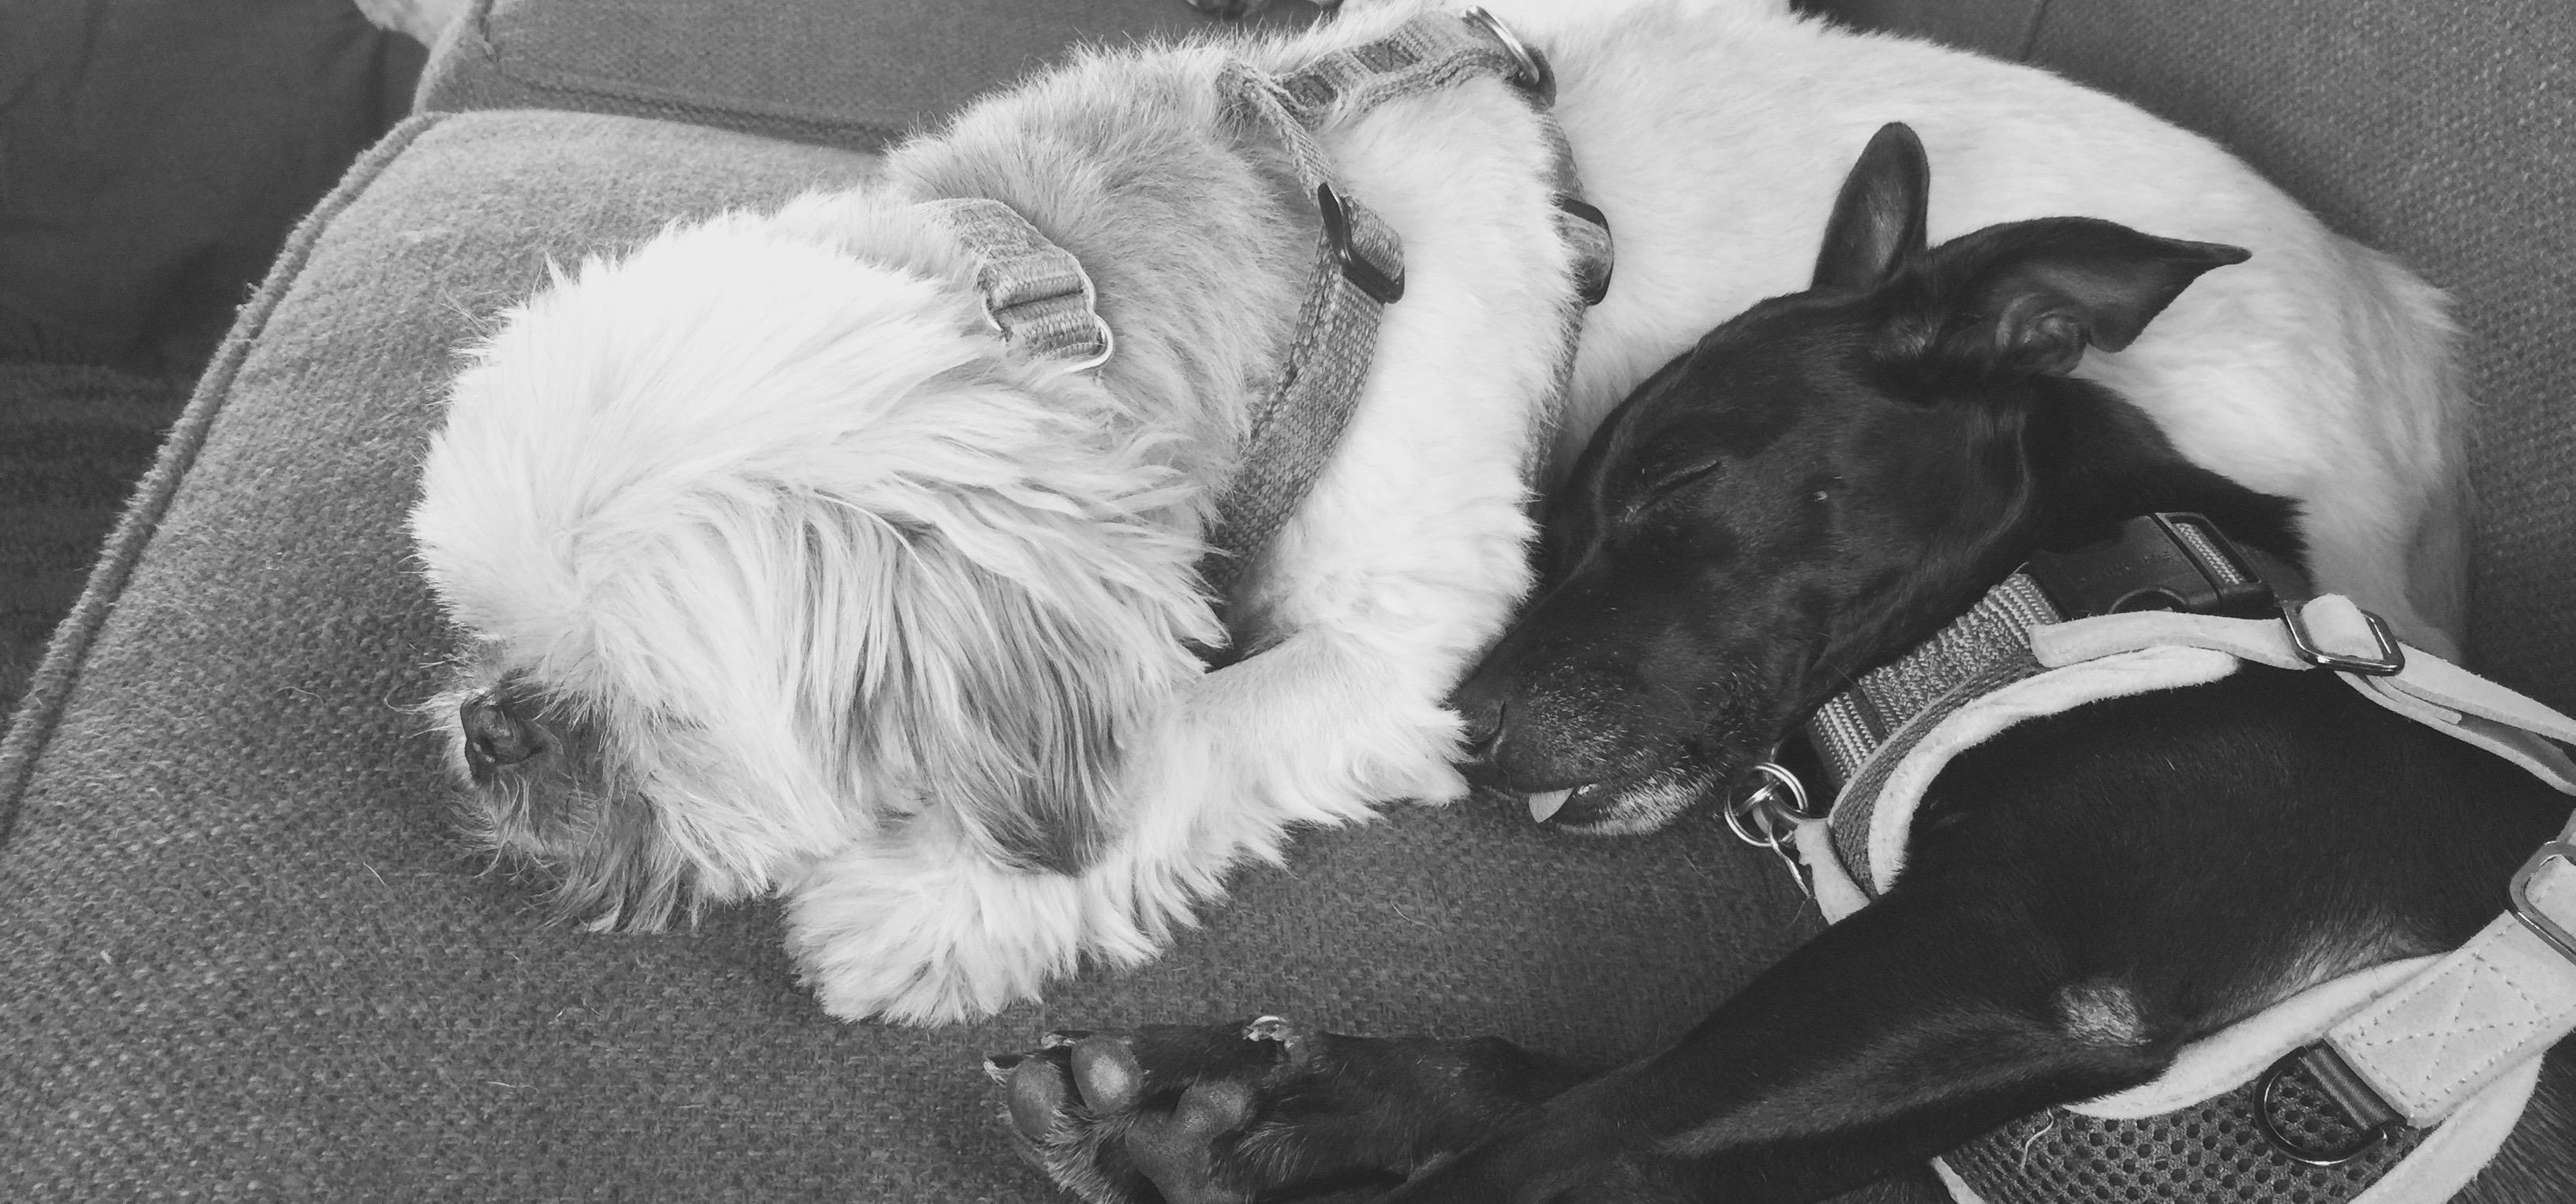 Sleeping shih tzu and chihuahua